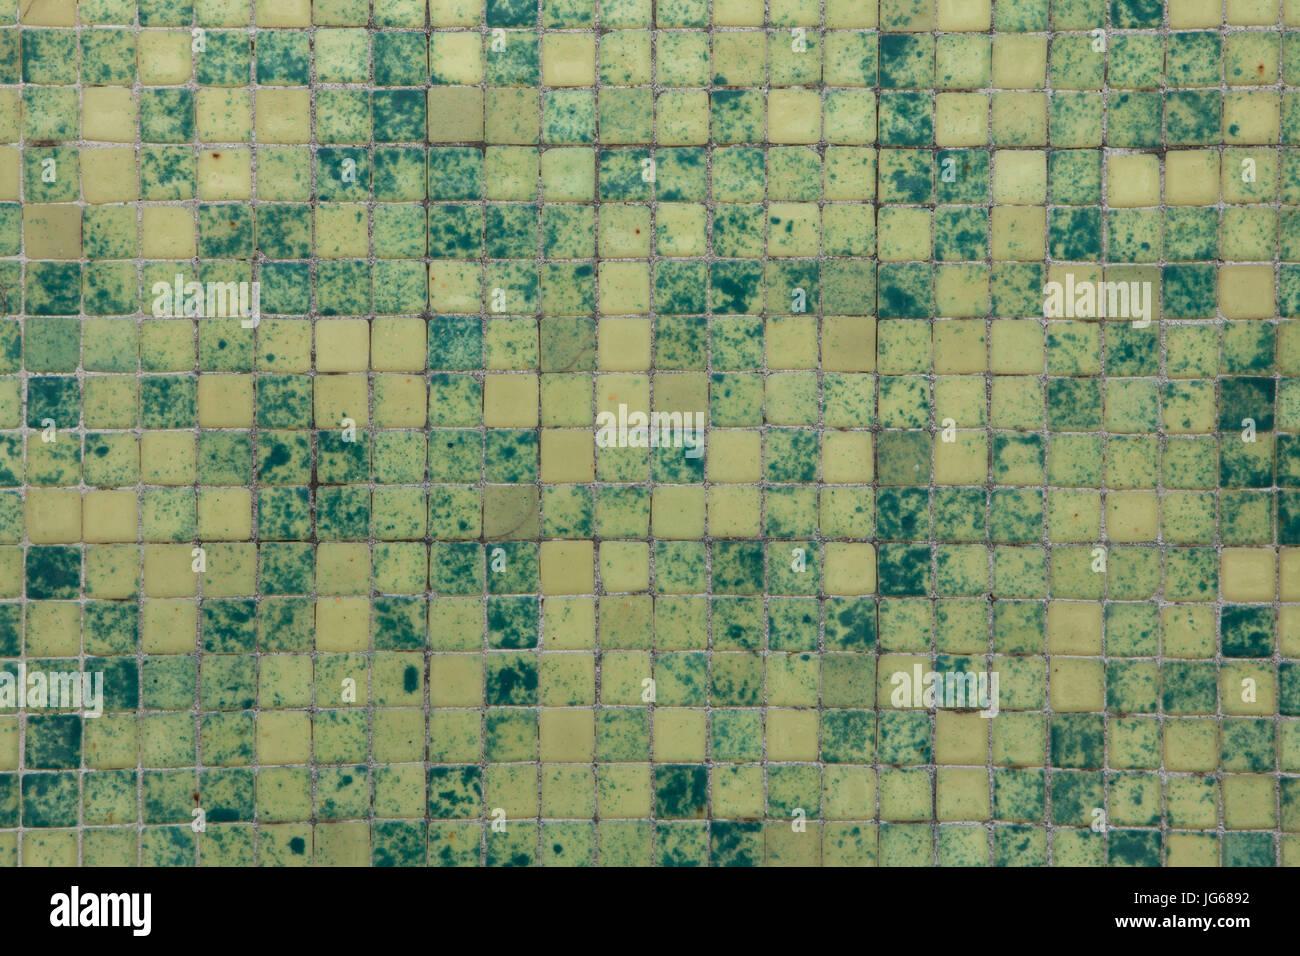 Piastrelle mosaico texture simo d spot texture seamless mosaico